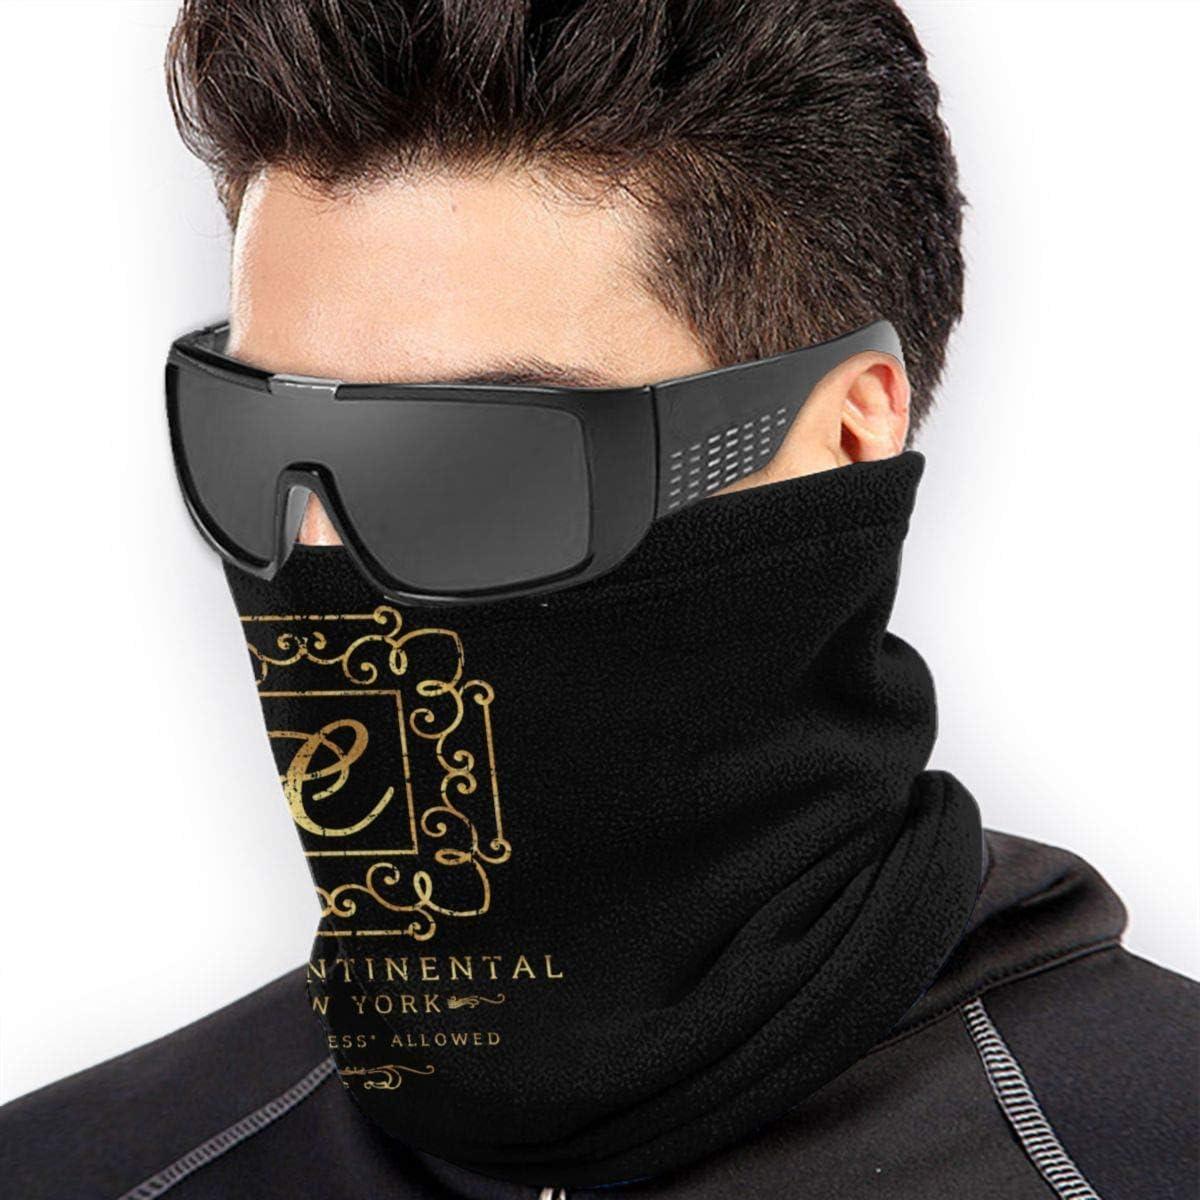 huatongxin Che Guevara Fashion Warm Ski Scaldacollo in microfibra caldo antivento